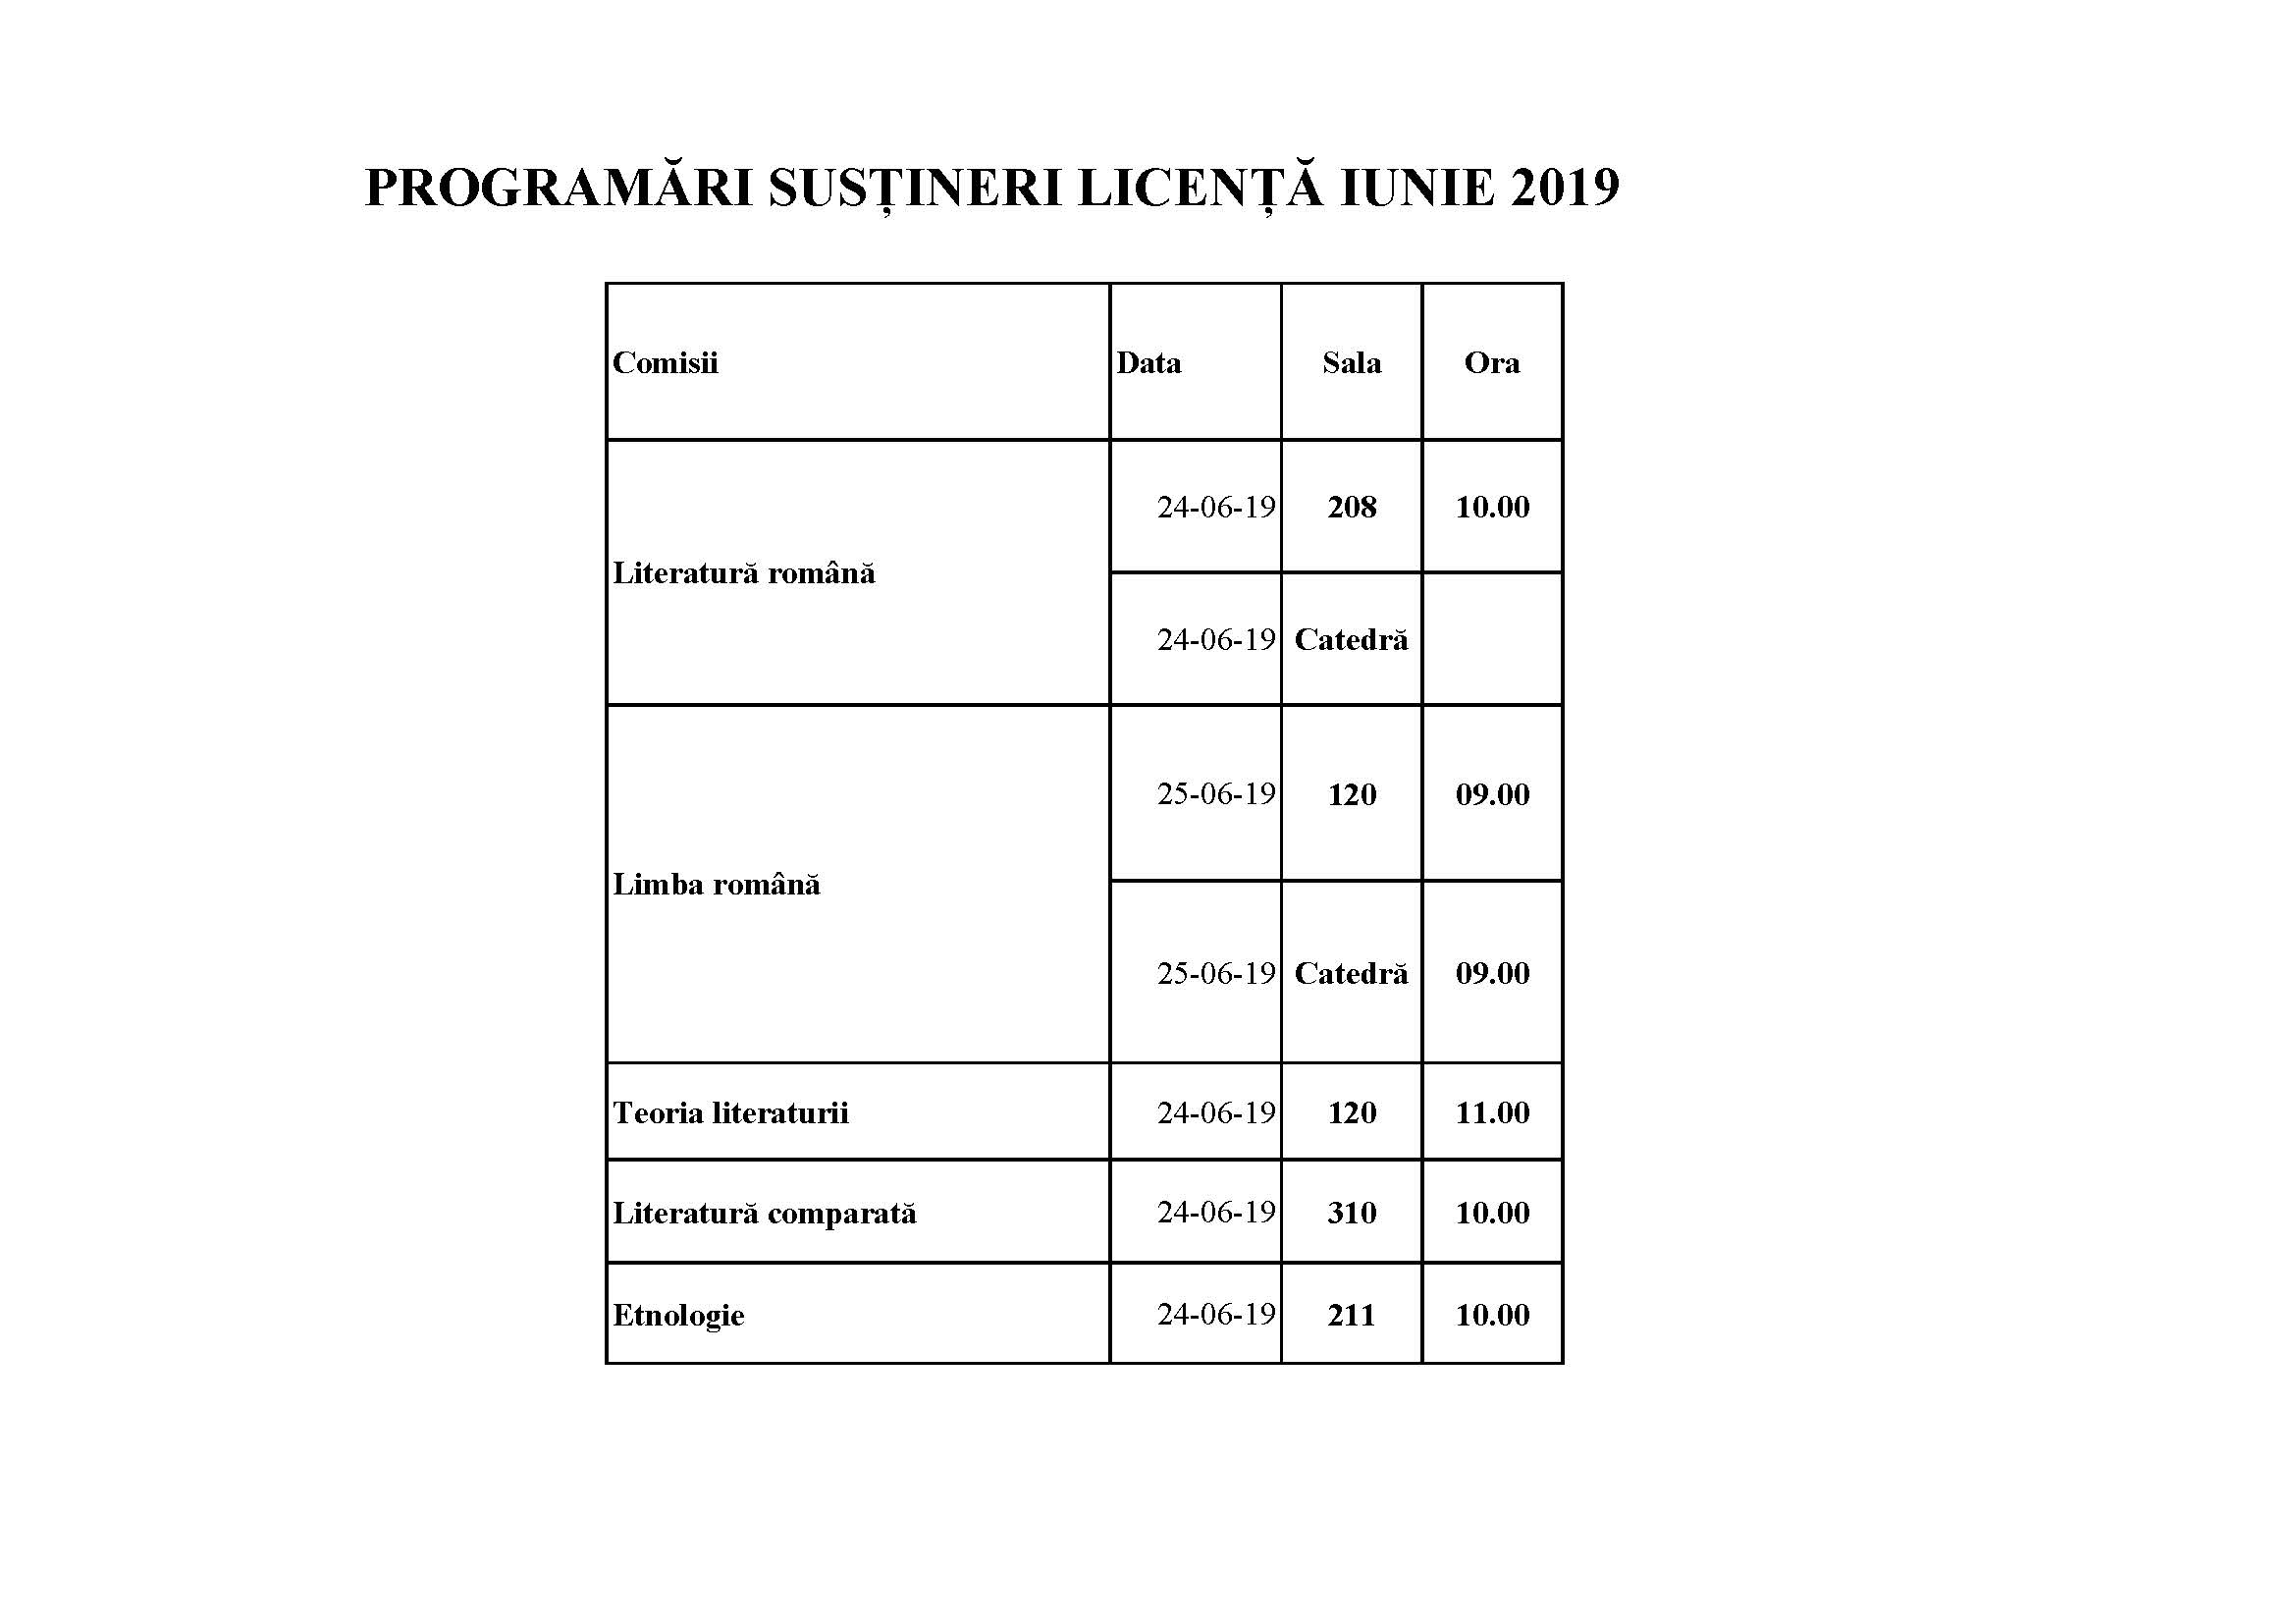 Programari-sustineri-licenta-LLR-2019